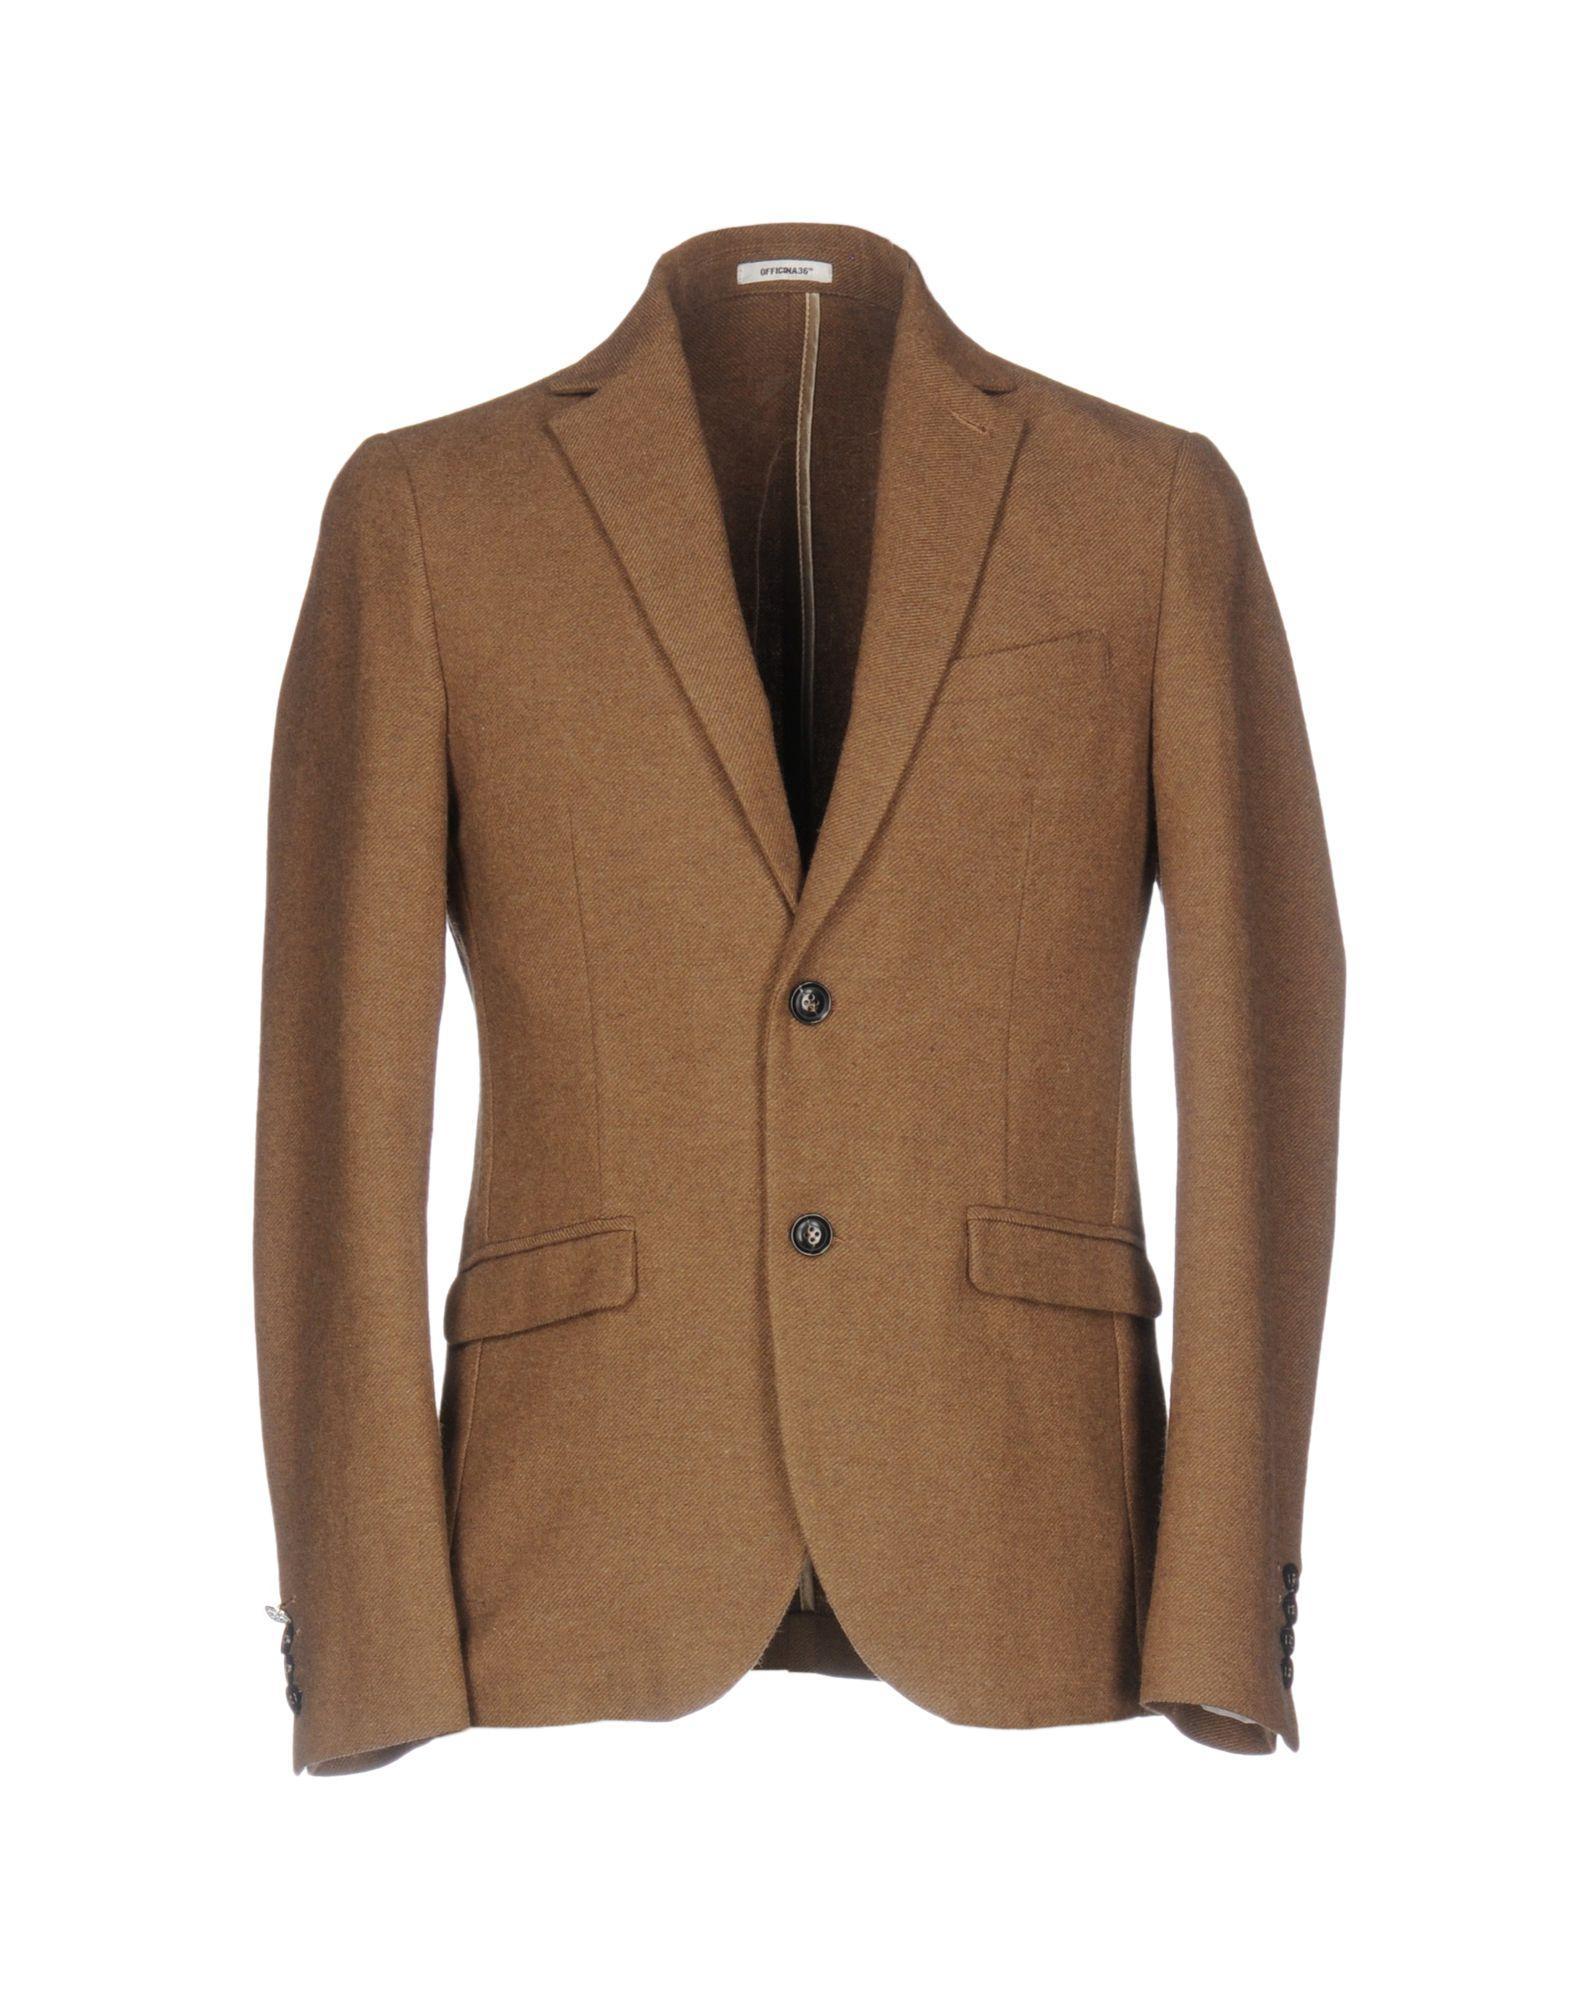 Product Description REACTION slim fit suit separate blazer that has a matching pant and.